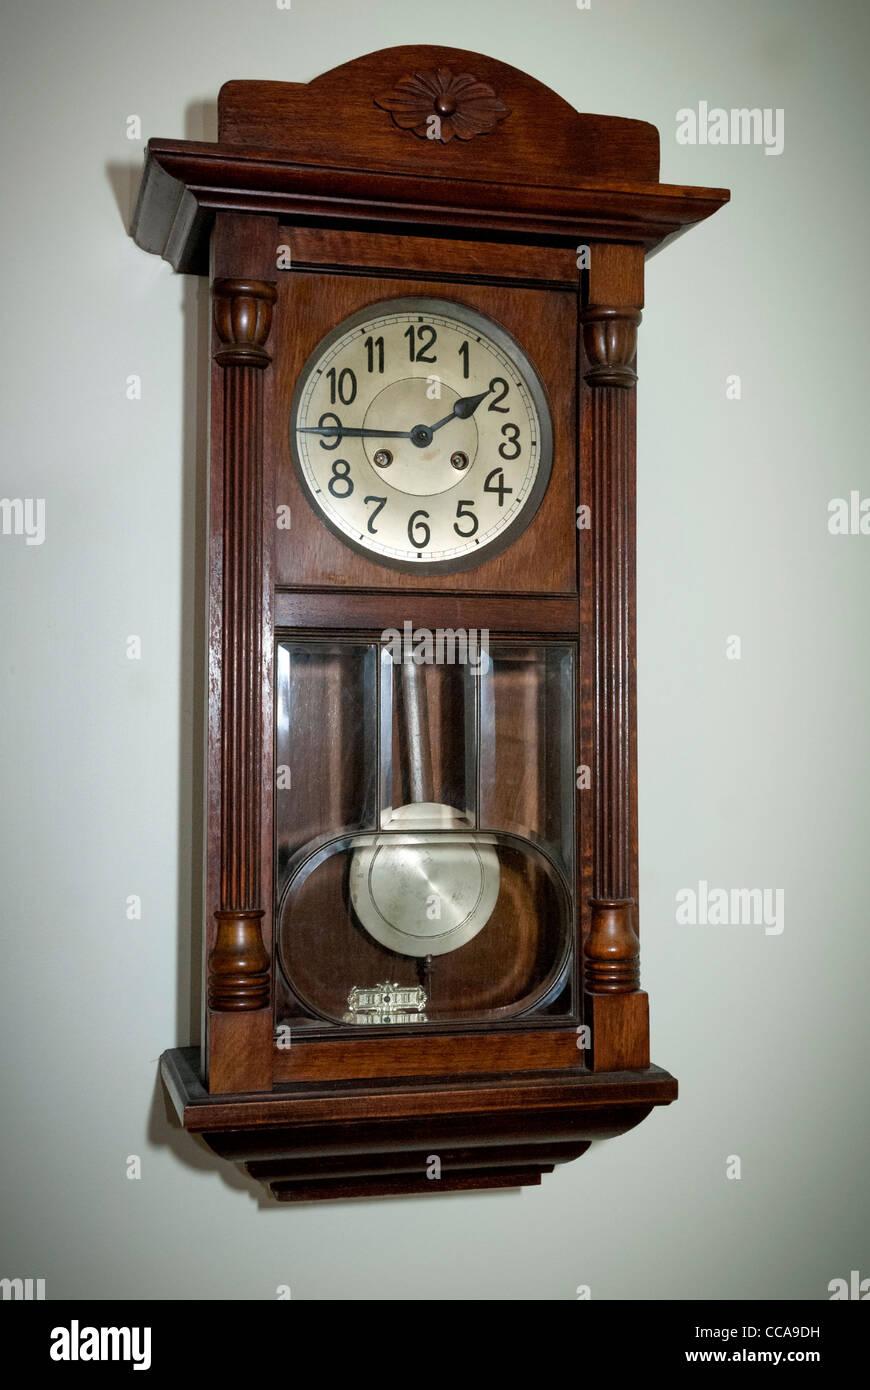 Antique Edwardian wall clock. - Stock Image